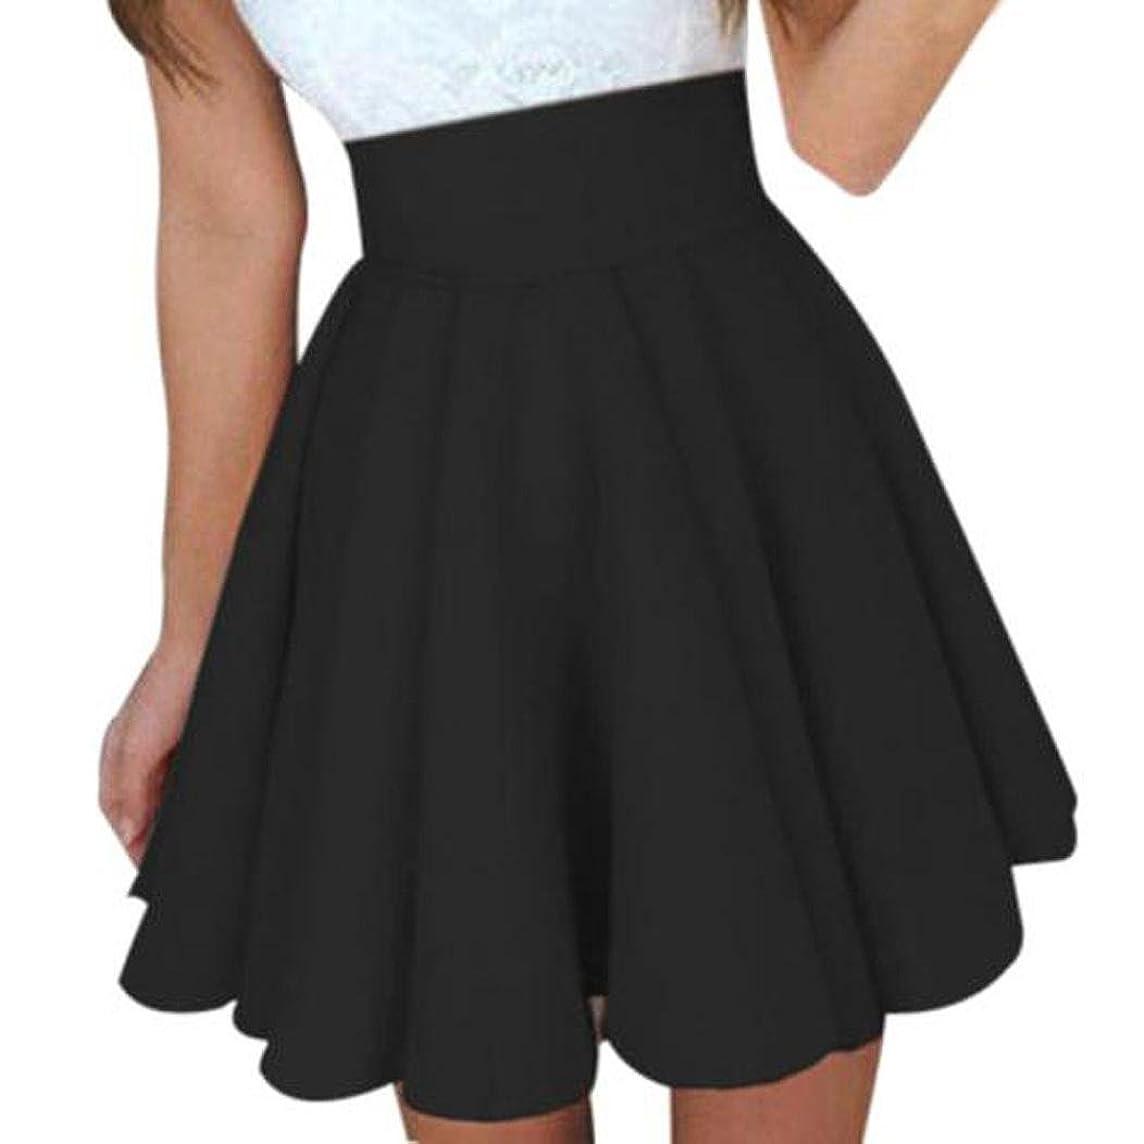 LISTHA Tulle Skirt for Women Organza Skirts High Waist Short Mini Pleated Shirt